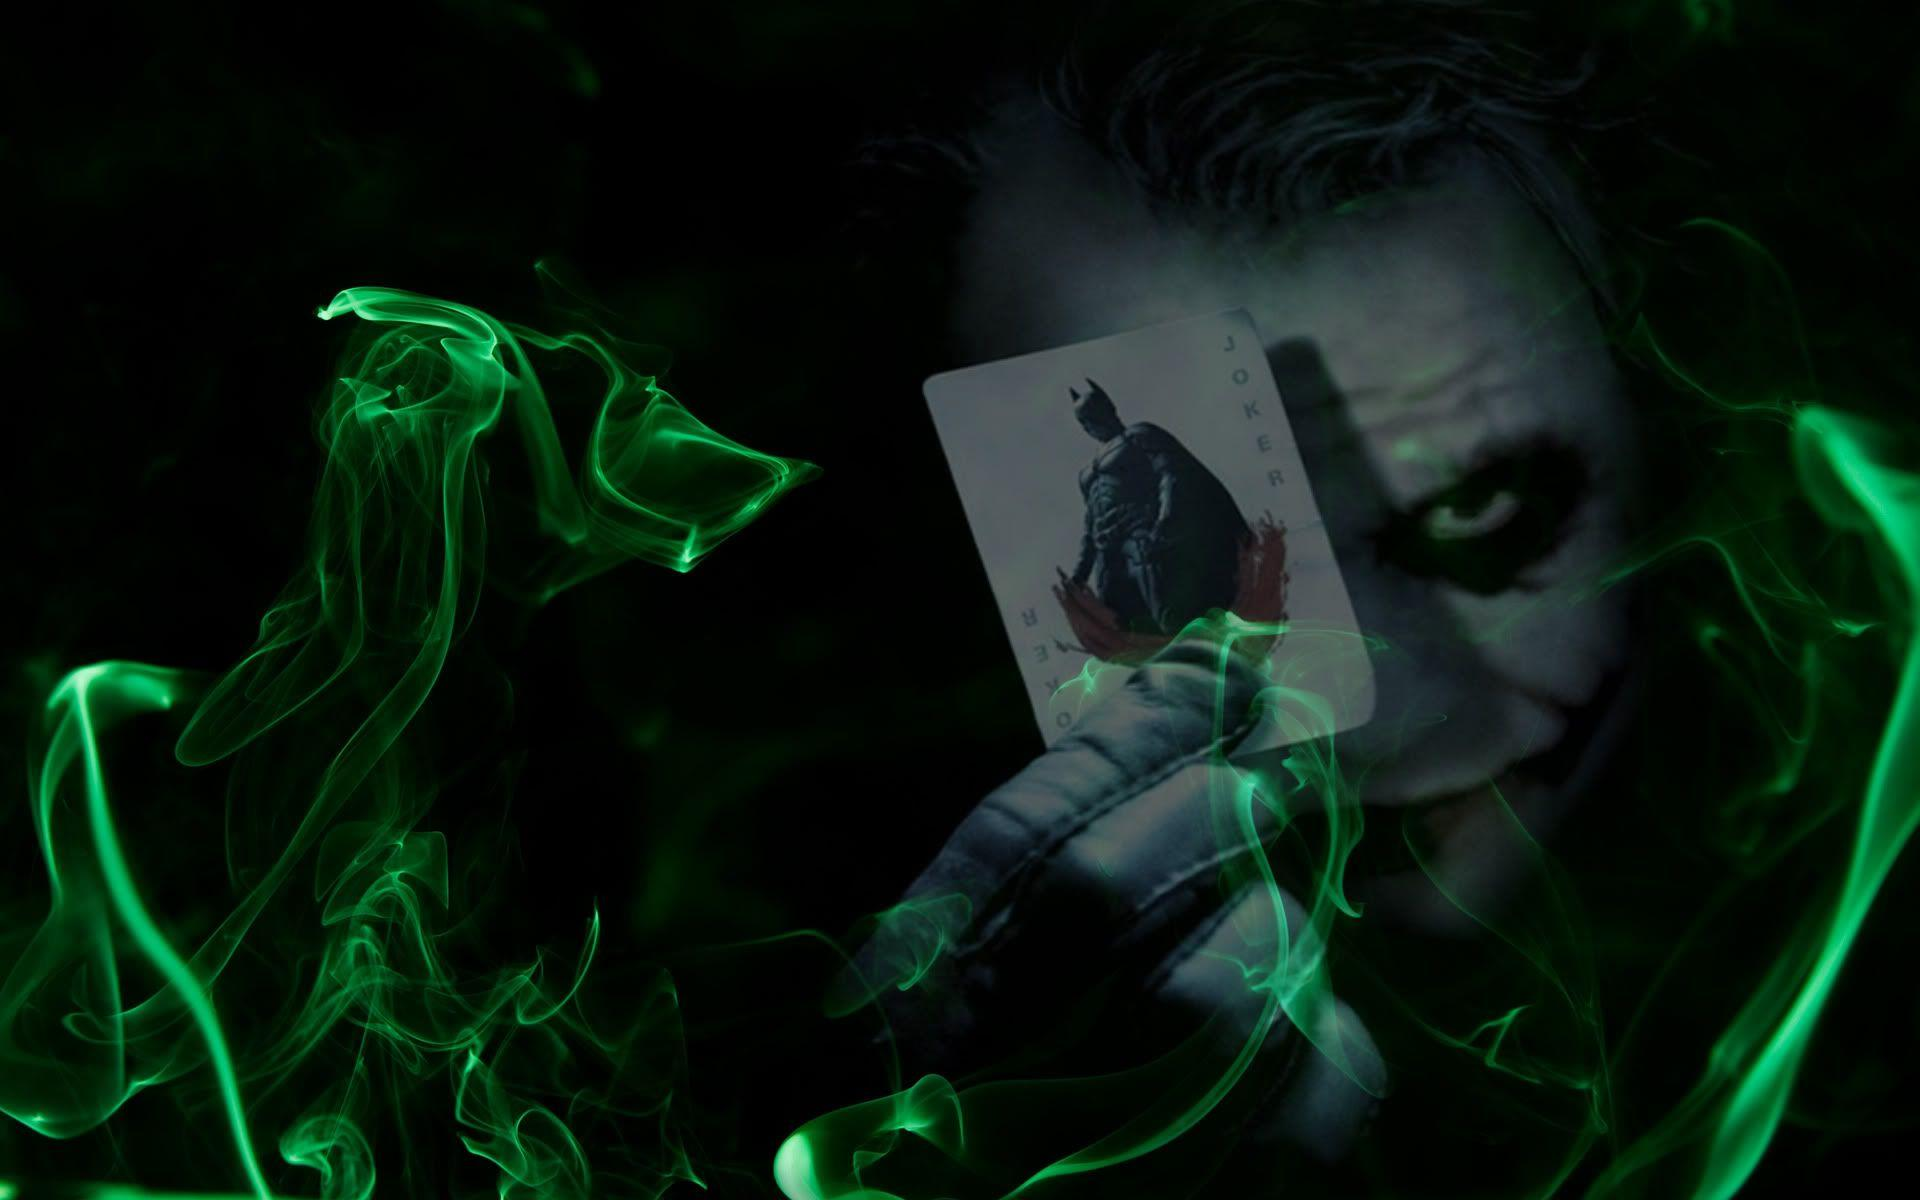 Joker HD Wallpapers 1920x1200